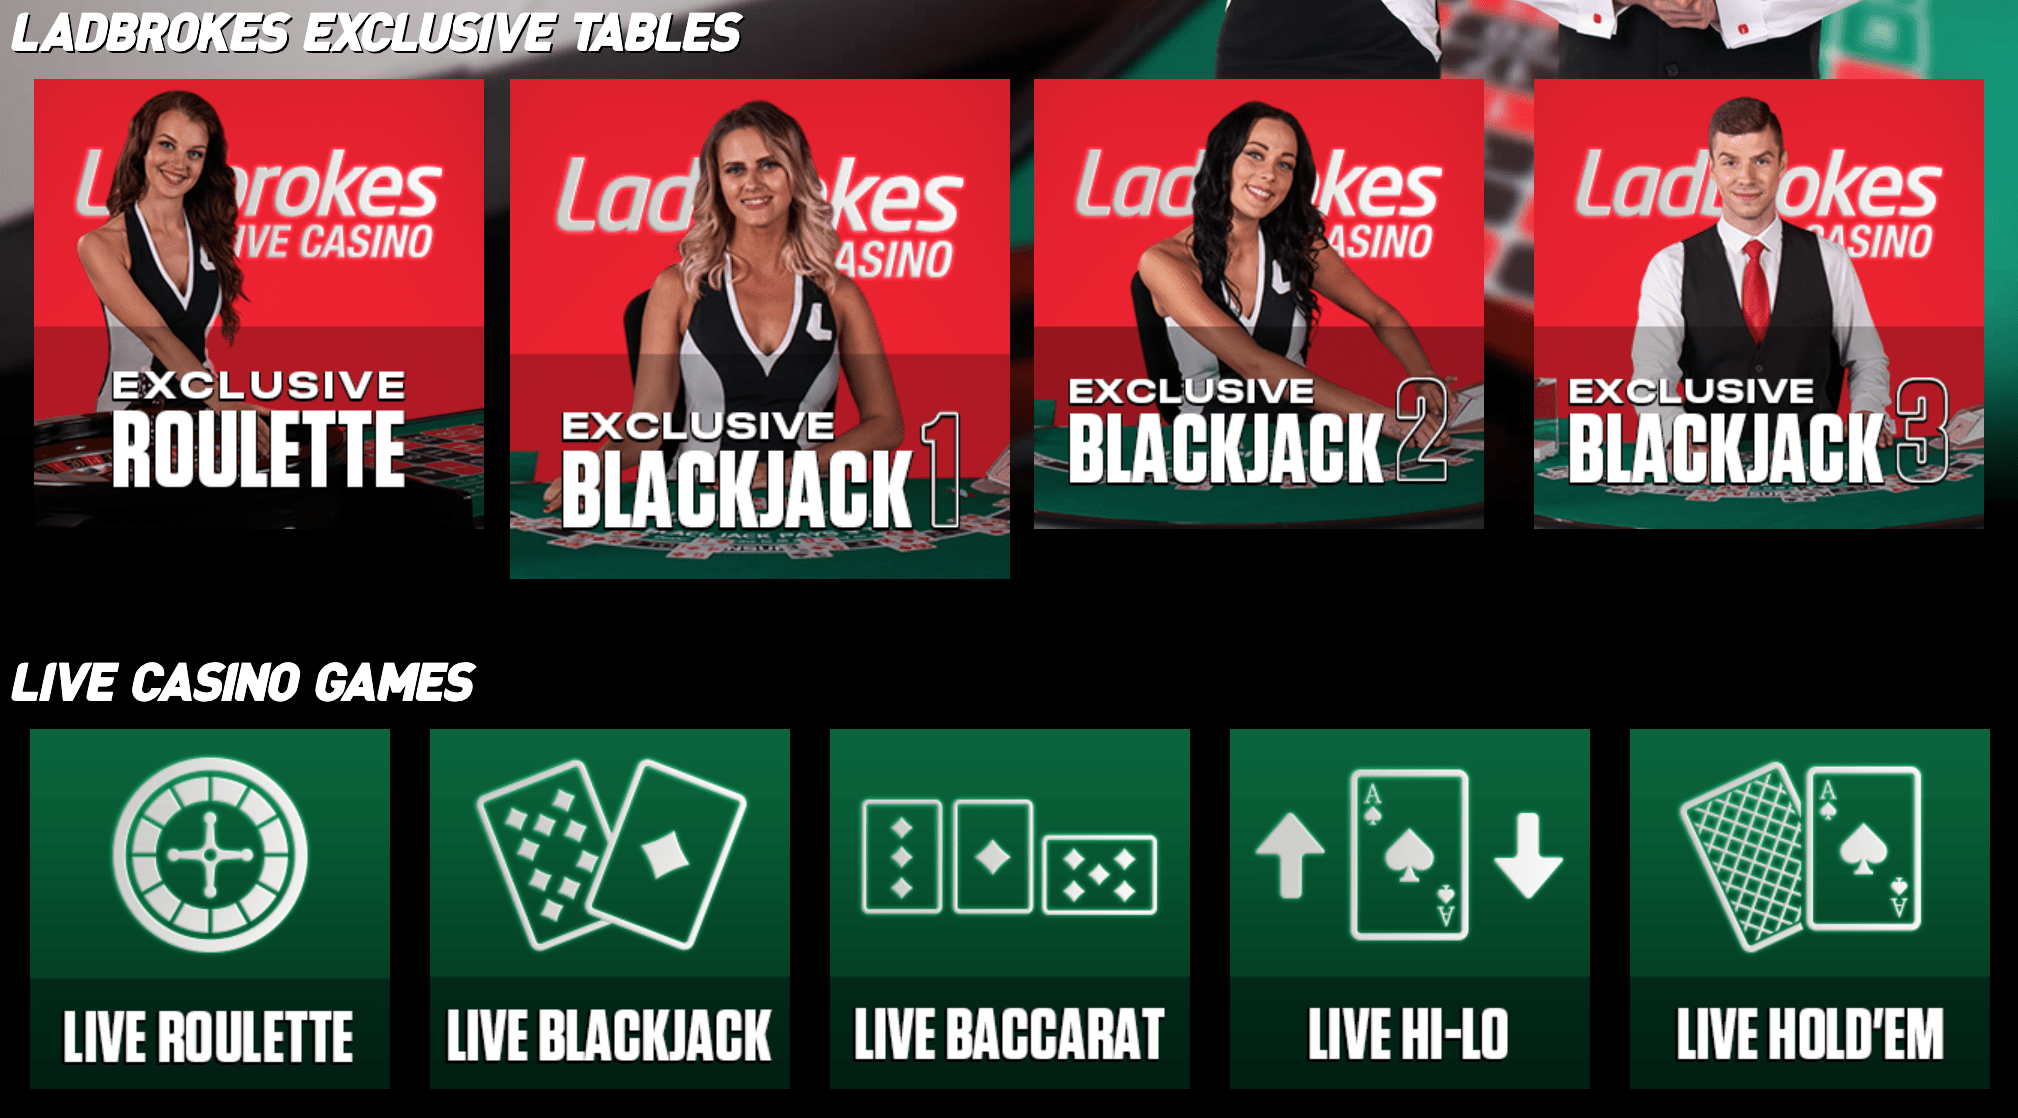 Ladbrokes live blackjack review